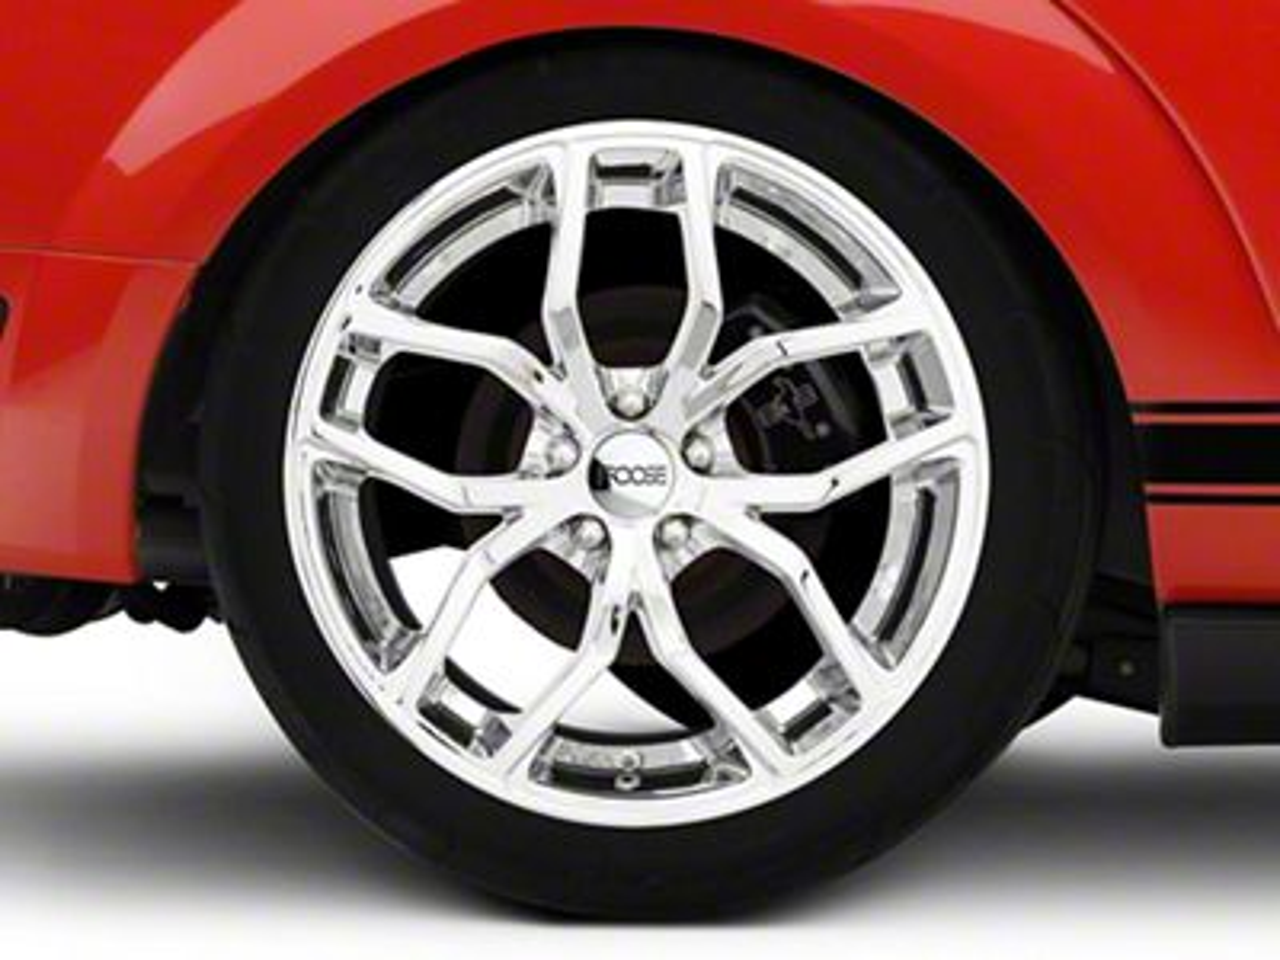 Foose Outcast Chrome Wheel - 20x10 - Rear Only (05-14 All)